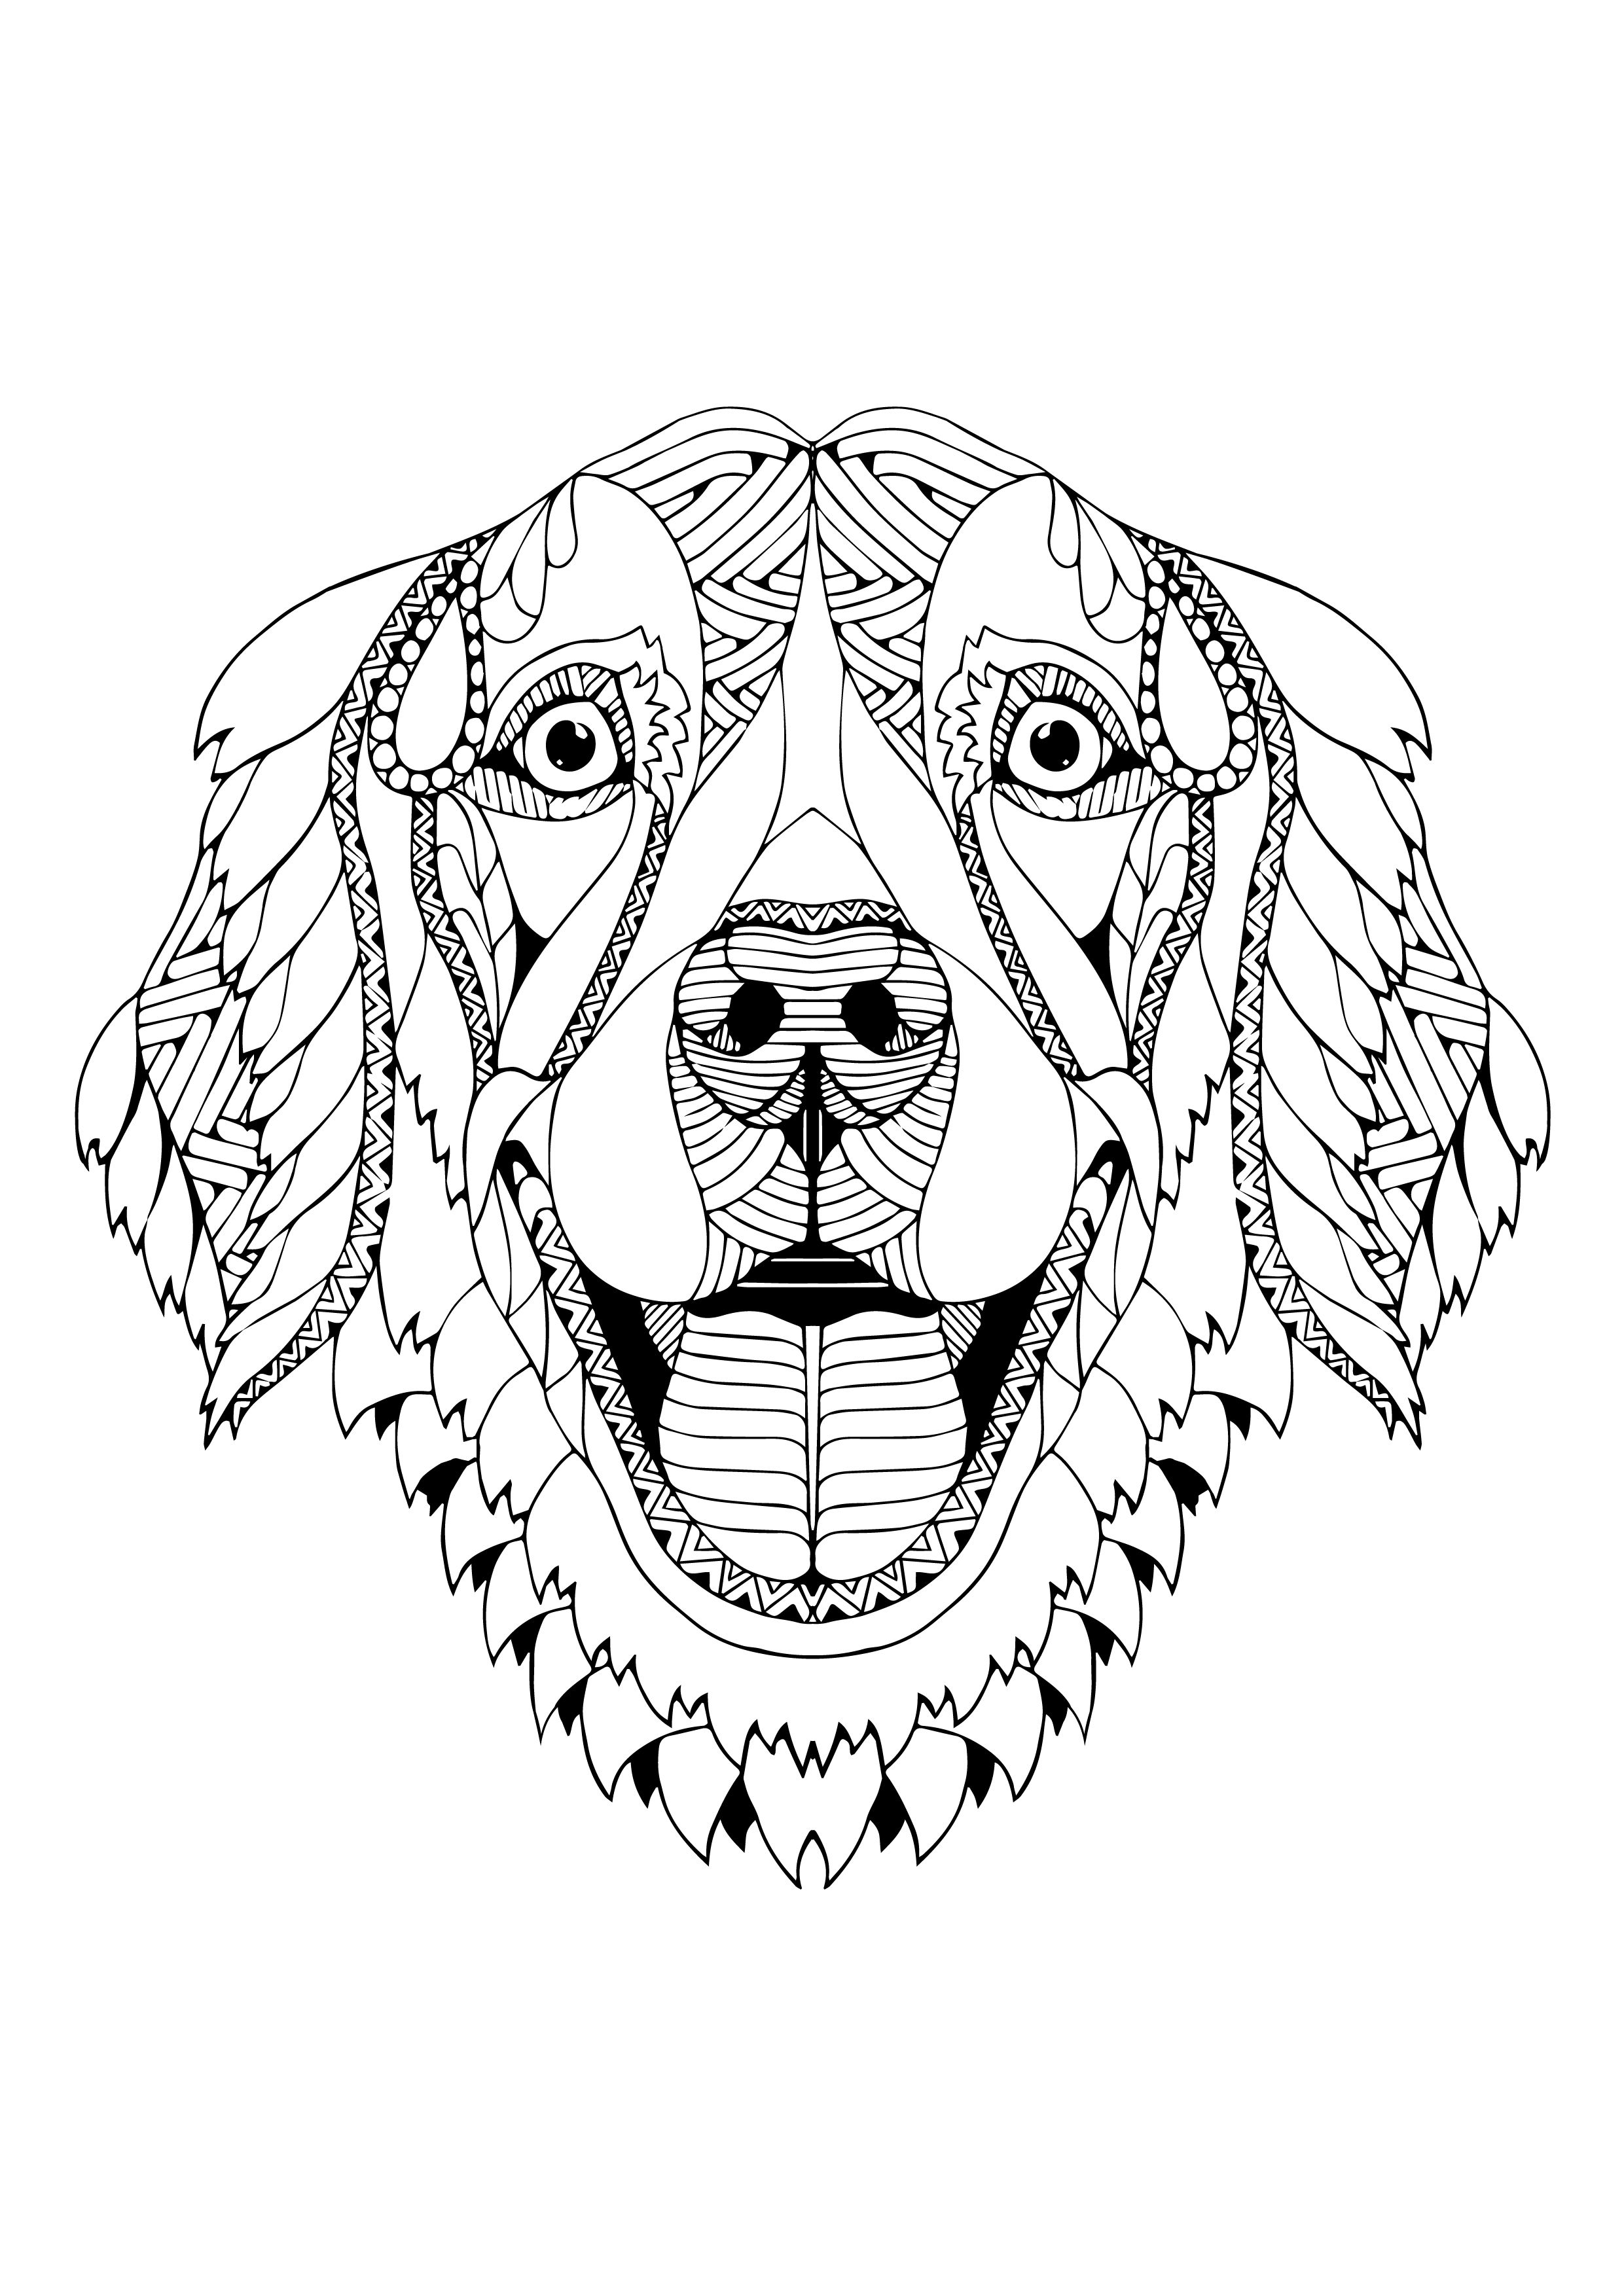 Facebook T Shirt Dog Coloring Page Animal Coloring Pages Dog Coloring Book [ 3508 x 2481 Pixel ]